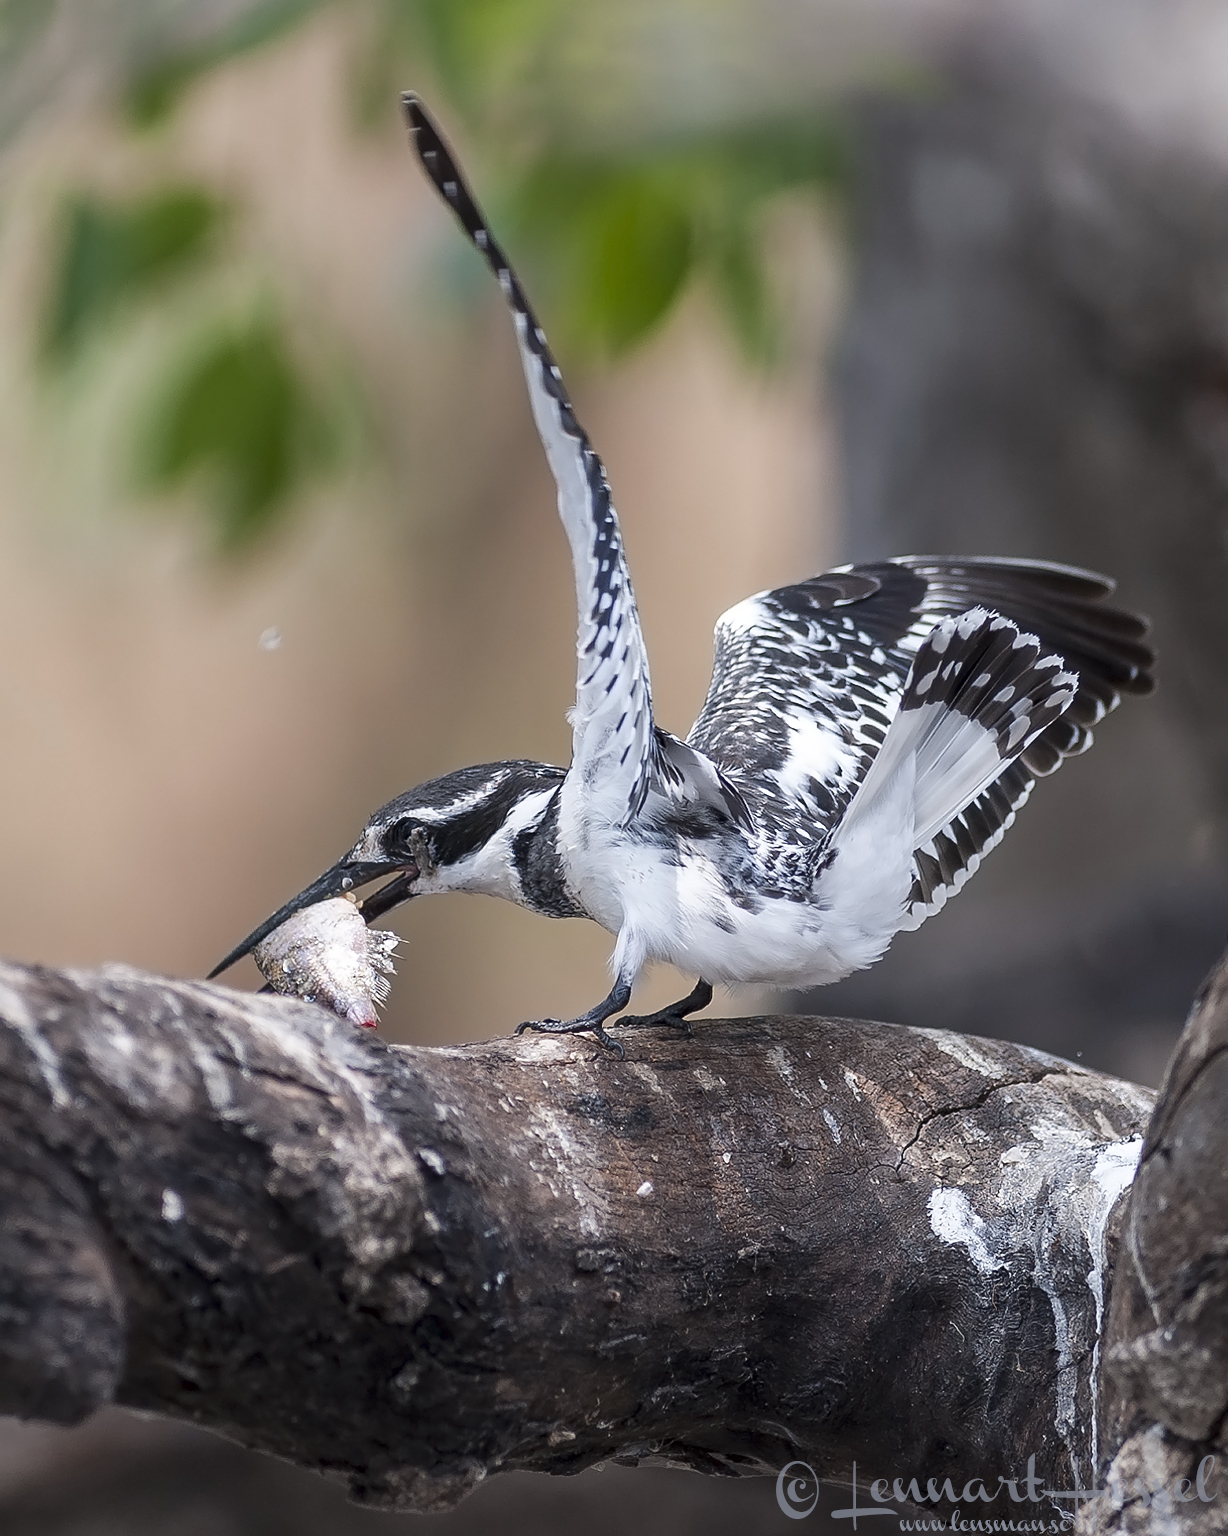 Pied Kingfisher at Chobe River, Botswana